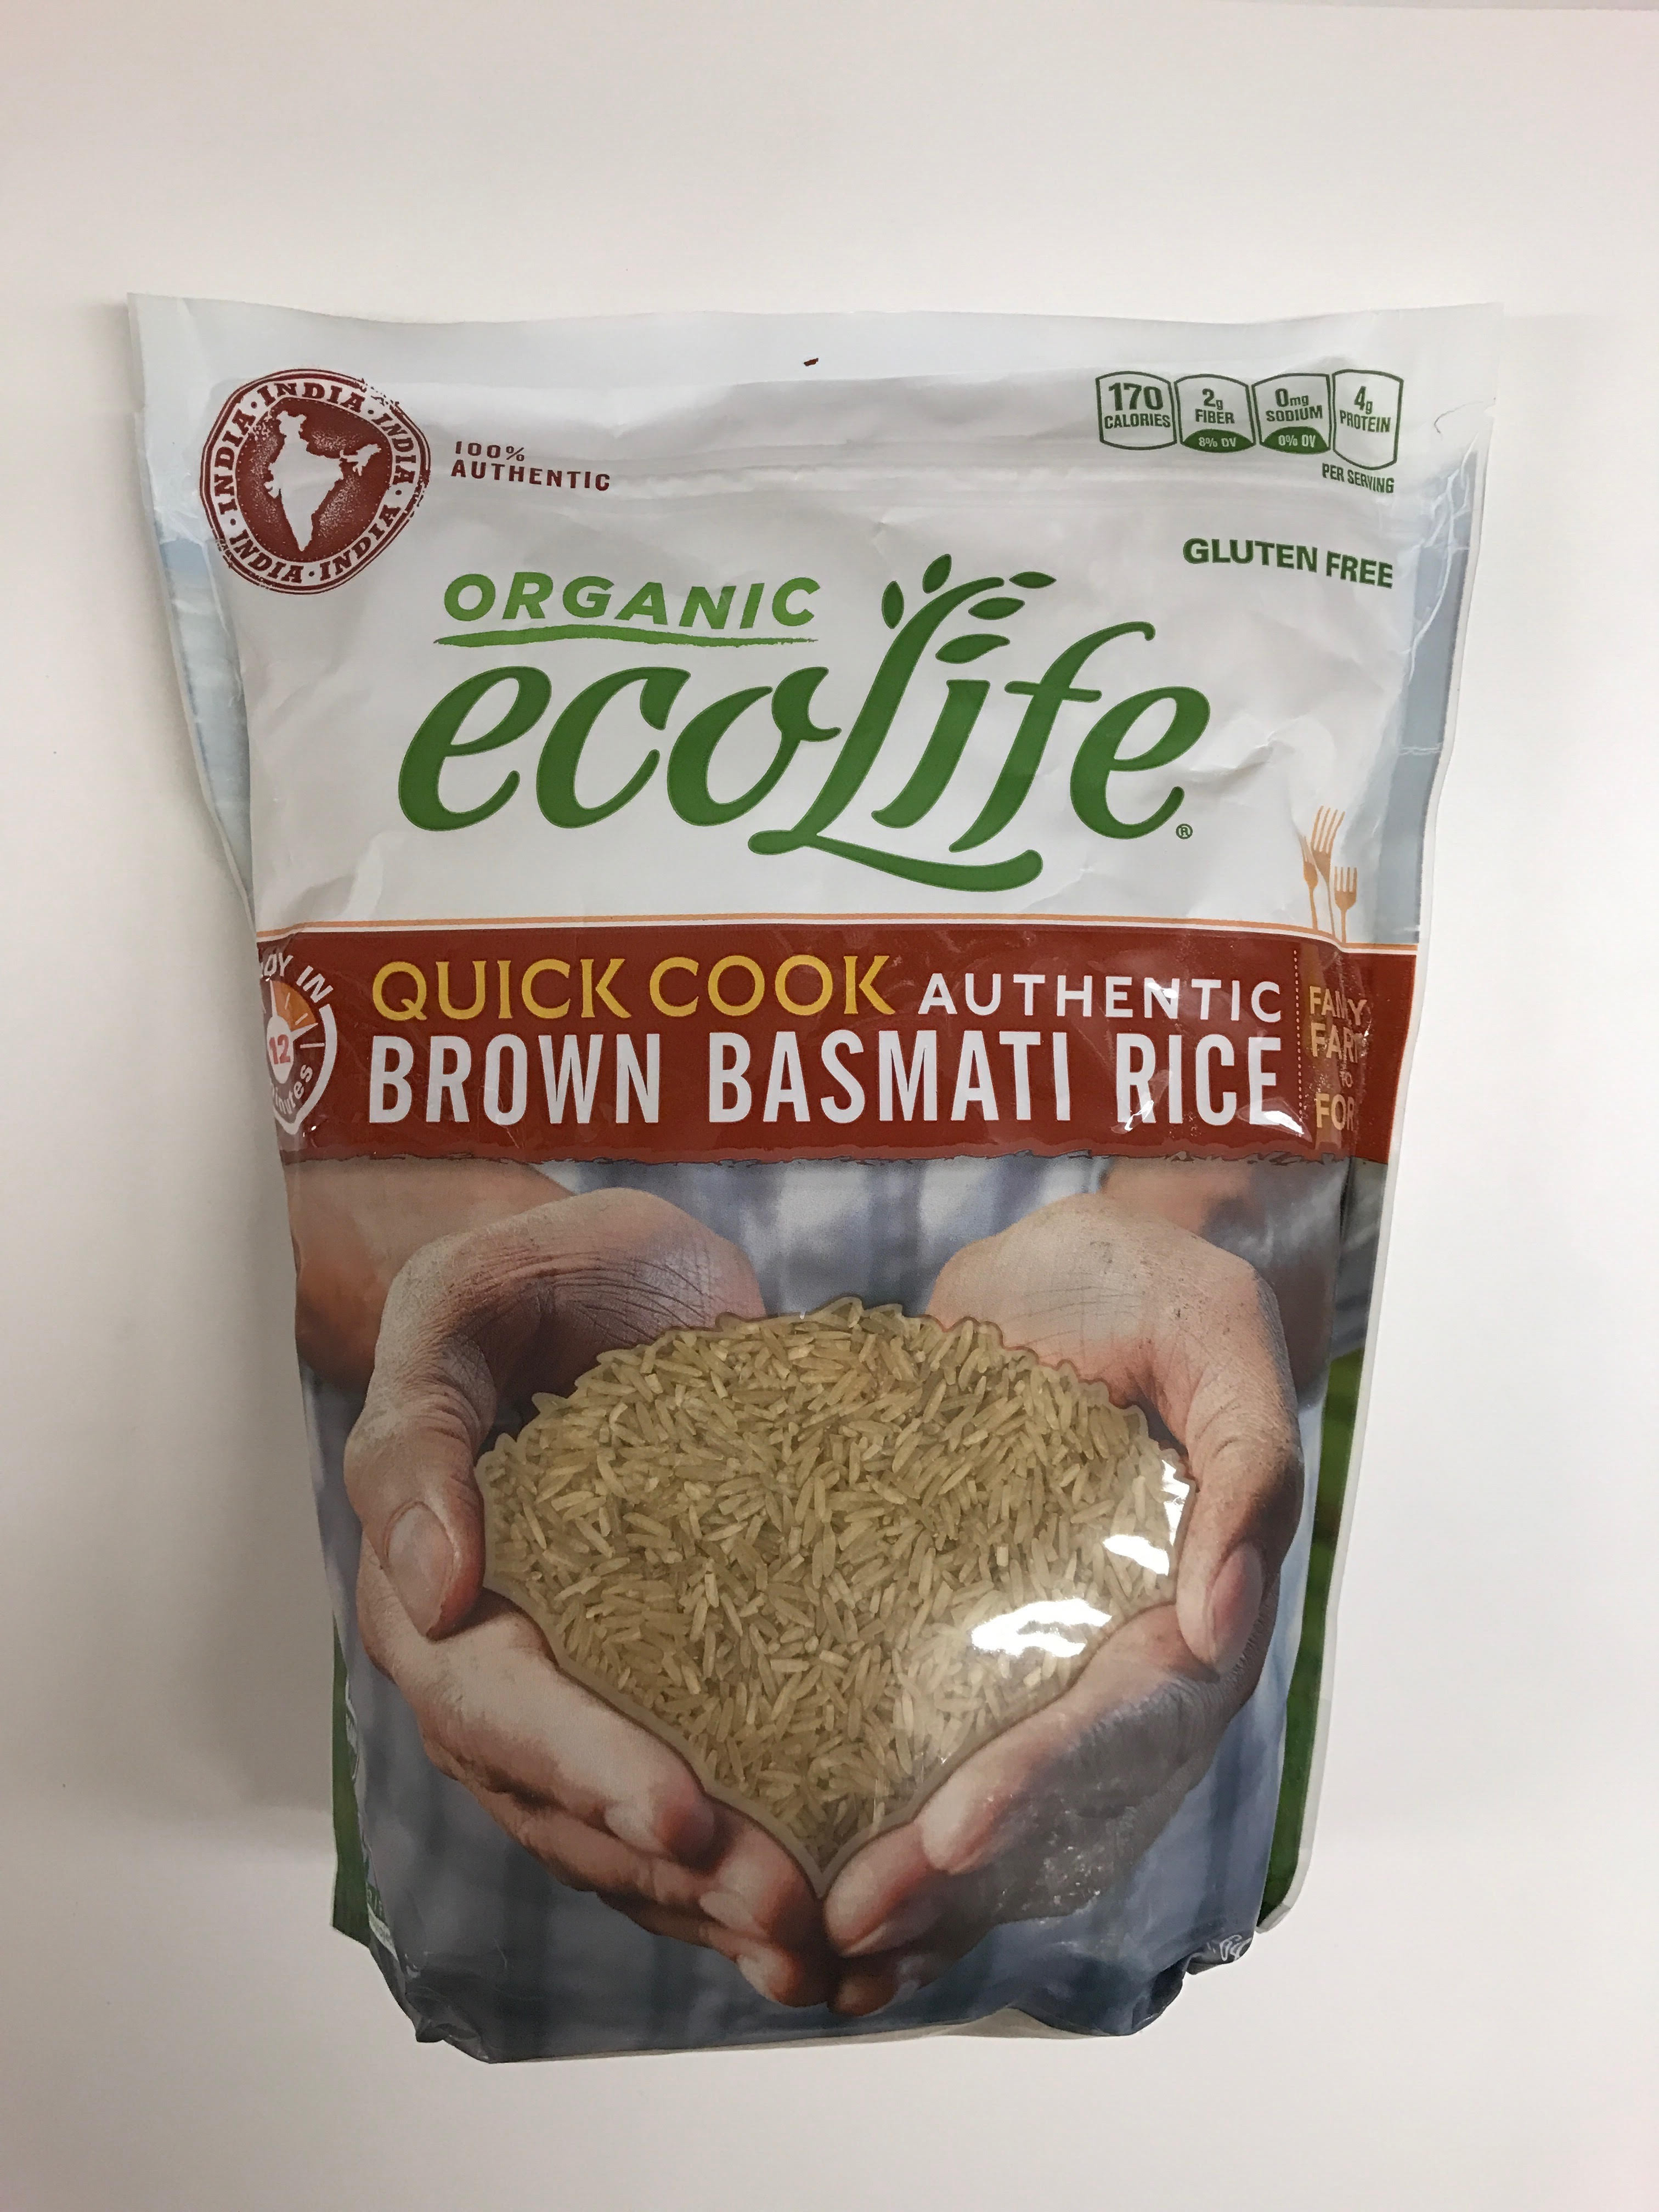 Organic Brown Basmati Rice  Kesar Grocery grocery rice Organic Ecolife Brown